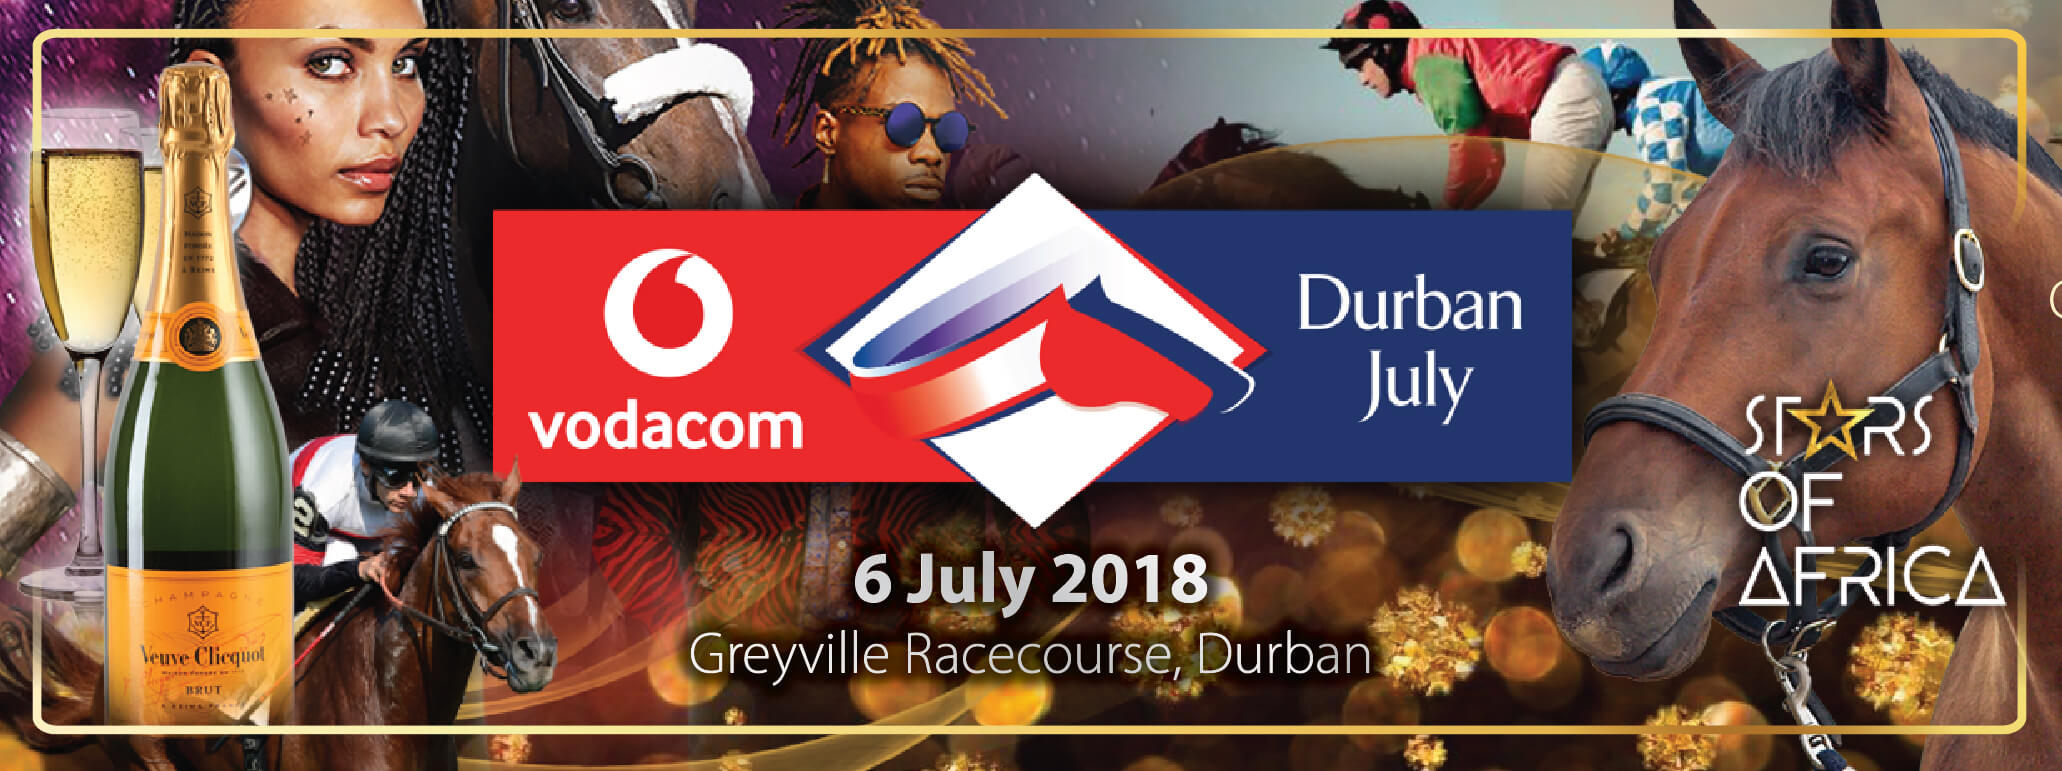 Vodacom Durban July 2019 - Beluga Hospitality-banner